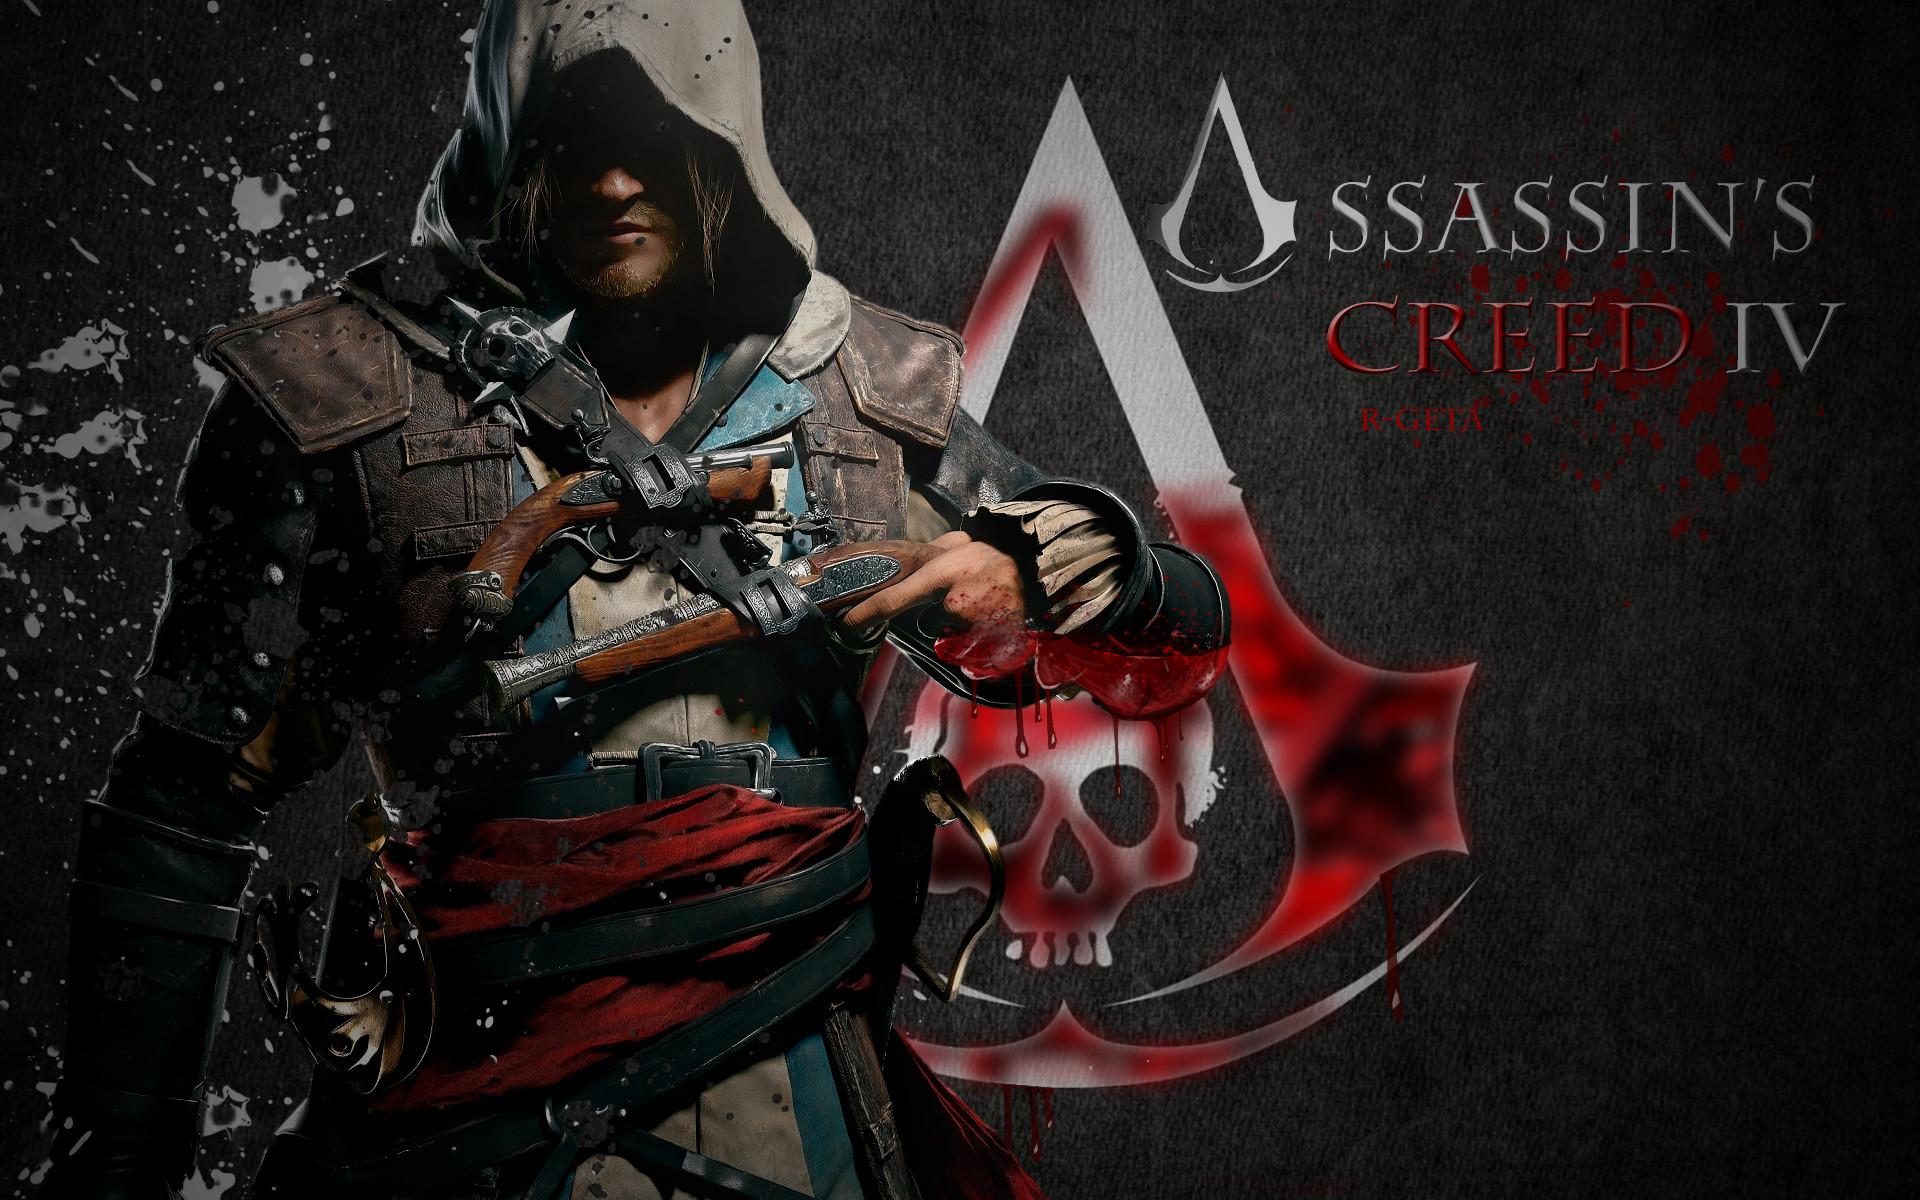 … Assassin's Creed IV: Black Flag